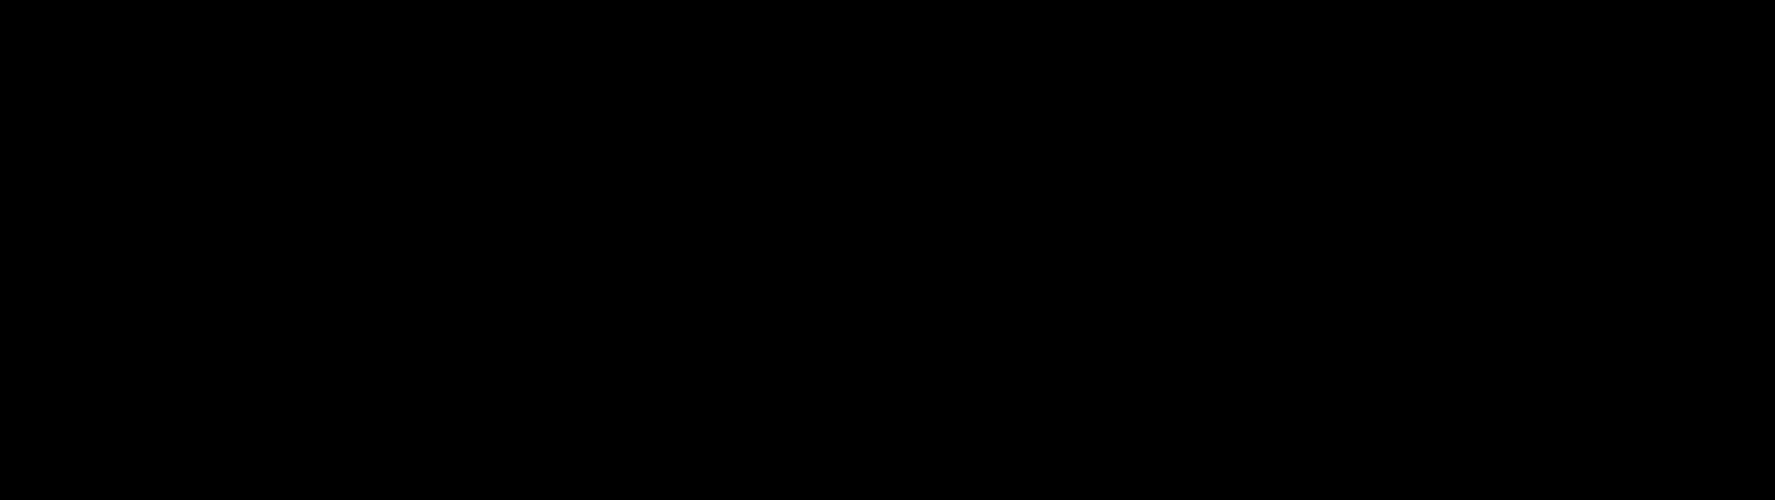 2006-logo-black.png